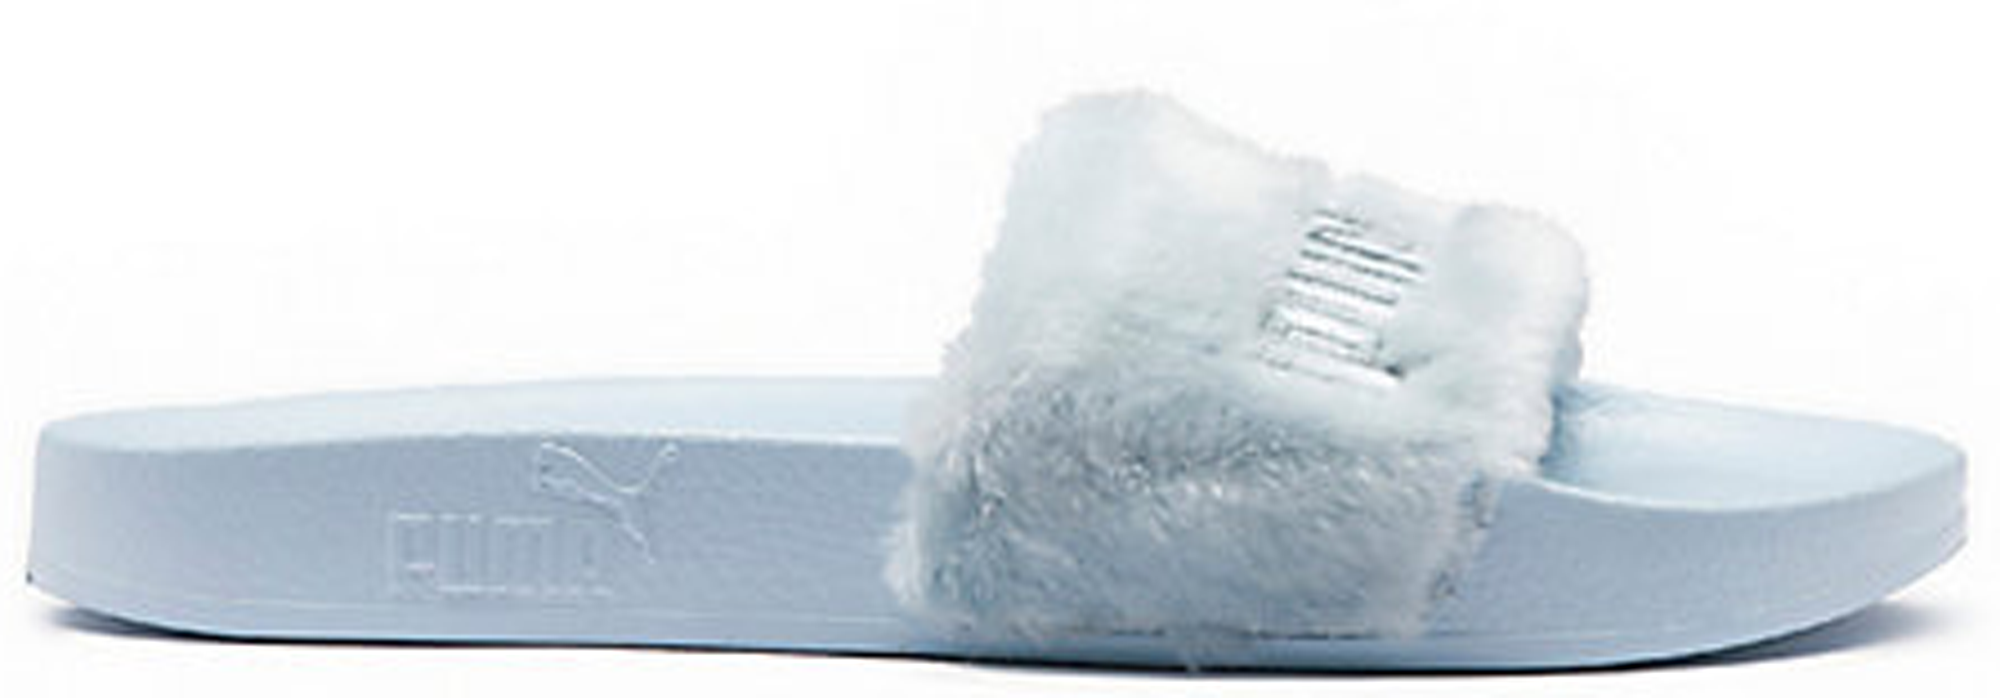 Puma Fur Slide Rihanna Fenty Cool Blue (W)